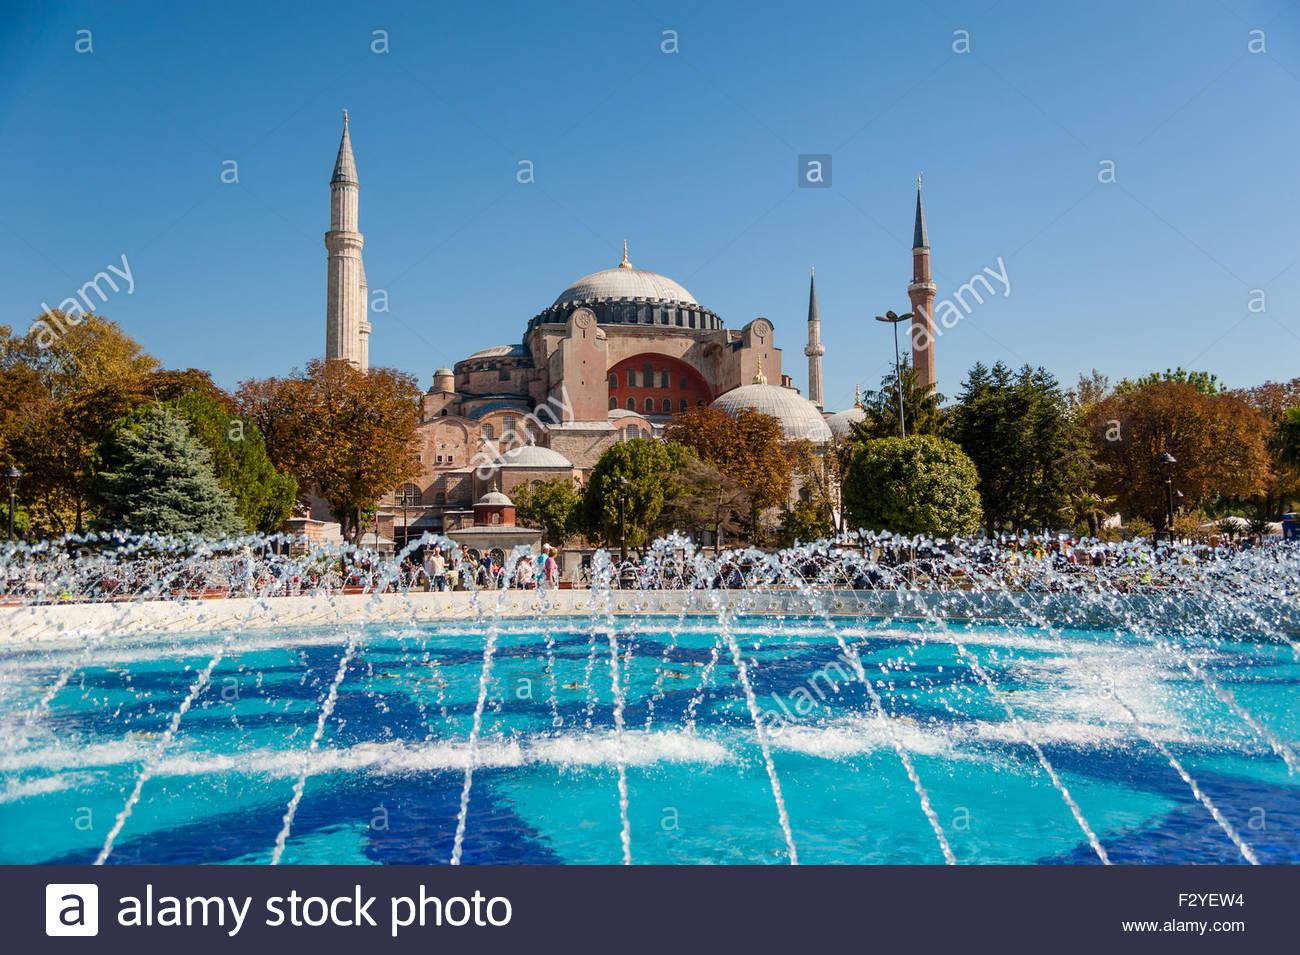 ISTANBUL, TURKEY – SEPTEMBER 23, 2012: Byzantine architecture of the Hagia Sophia (The Church of the Holy Wisdom) - Stock Image